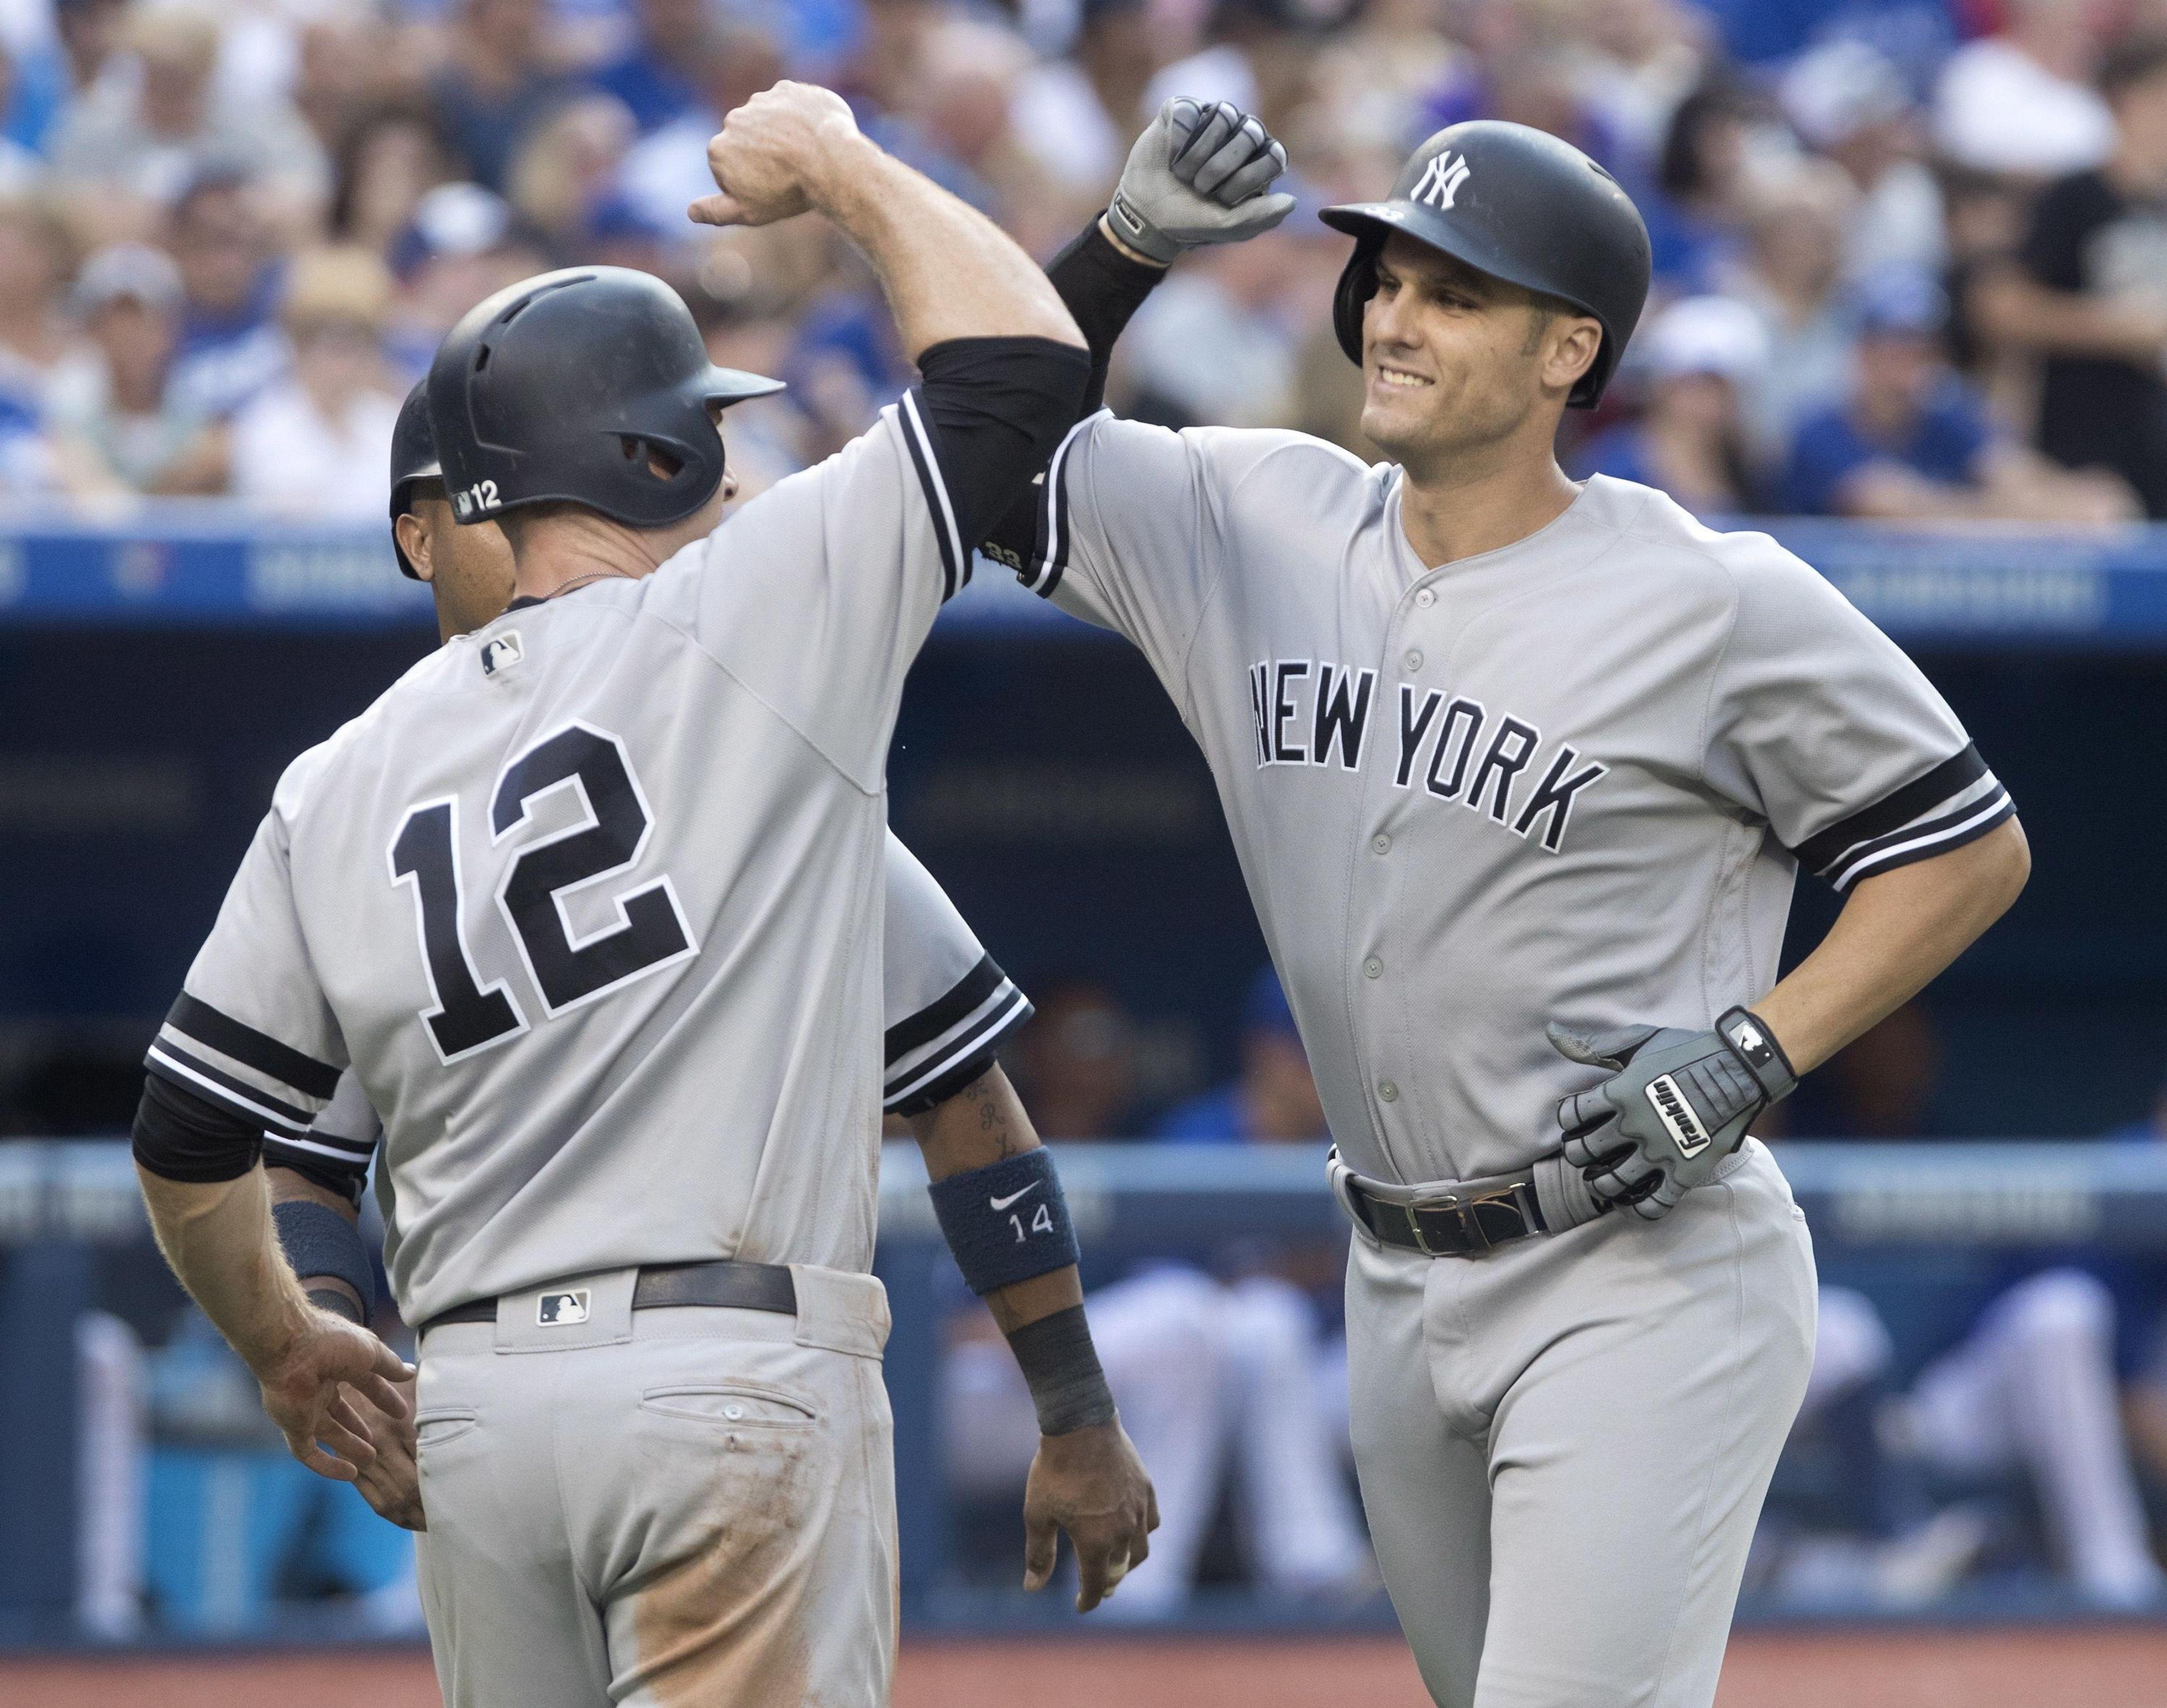 Yankees_blue_jays_baseball_03616_s4096x3228